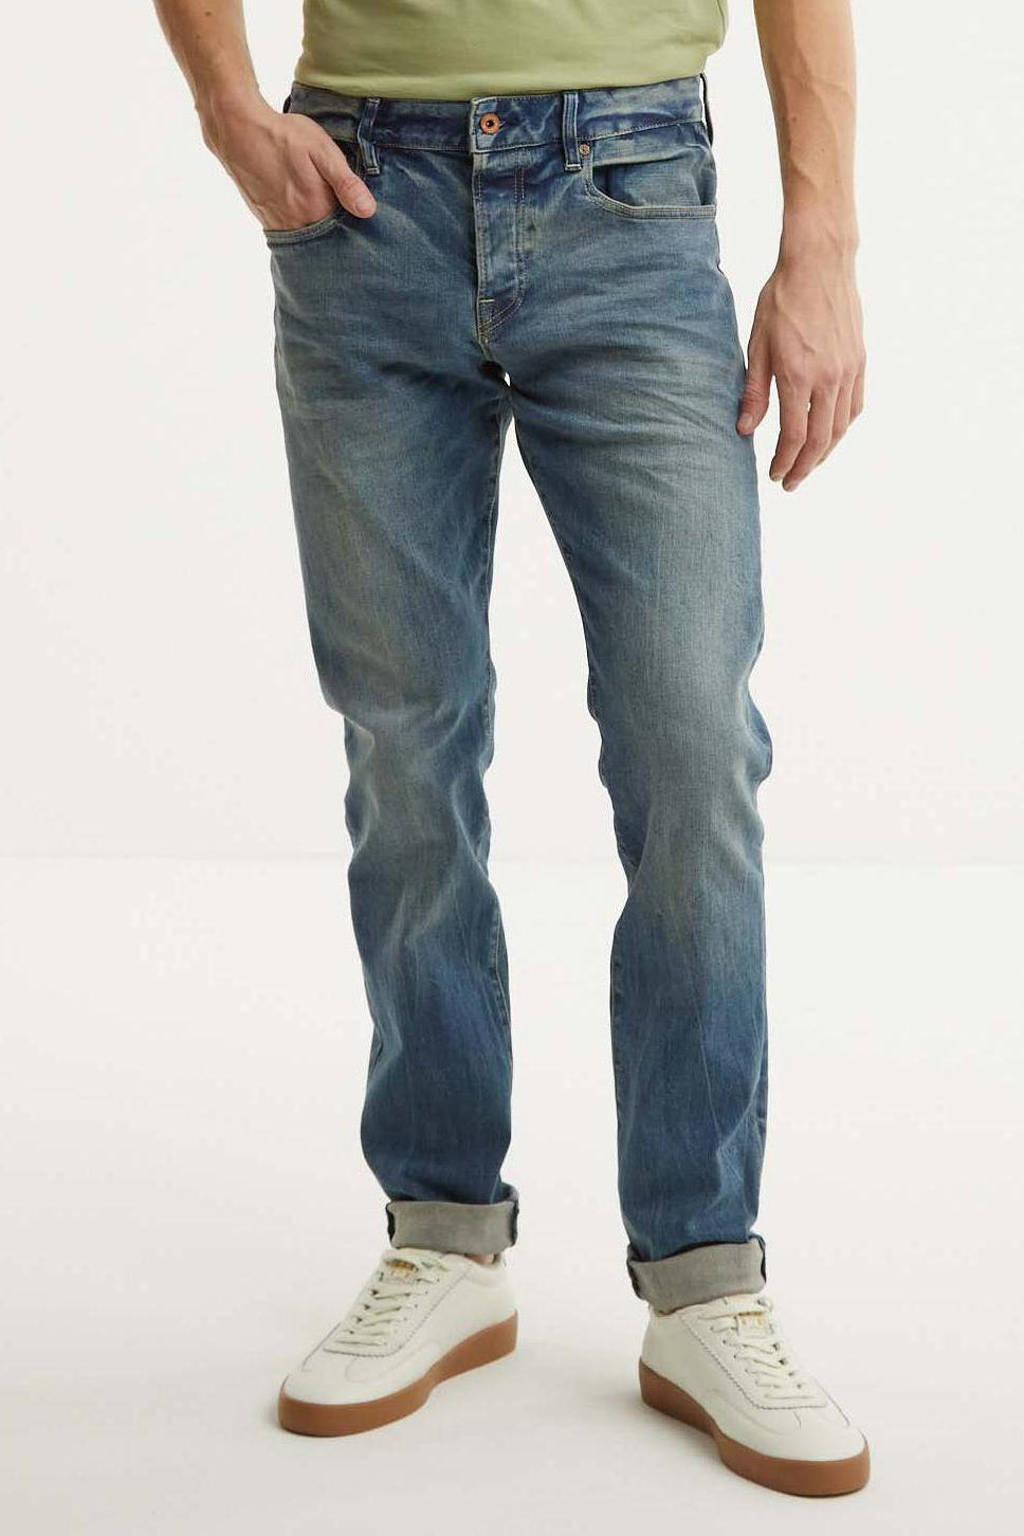 Scotch & Soda regular fit jeans Ralston scrape and shift, Scrape and Shift